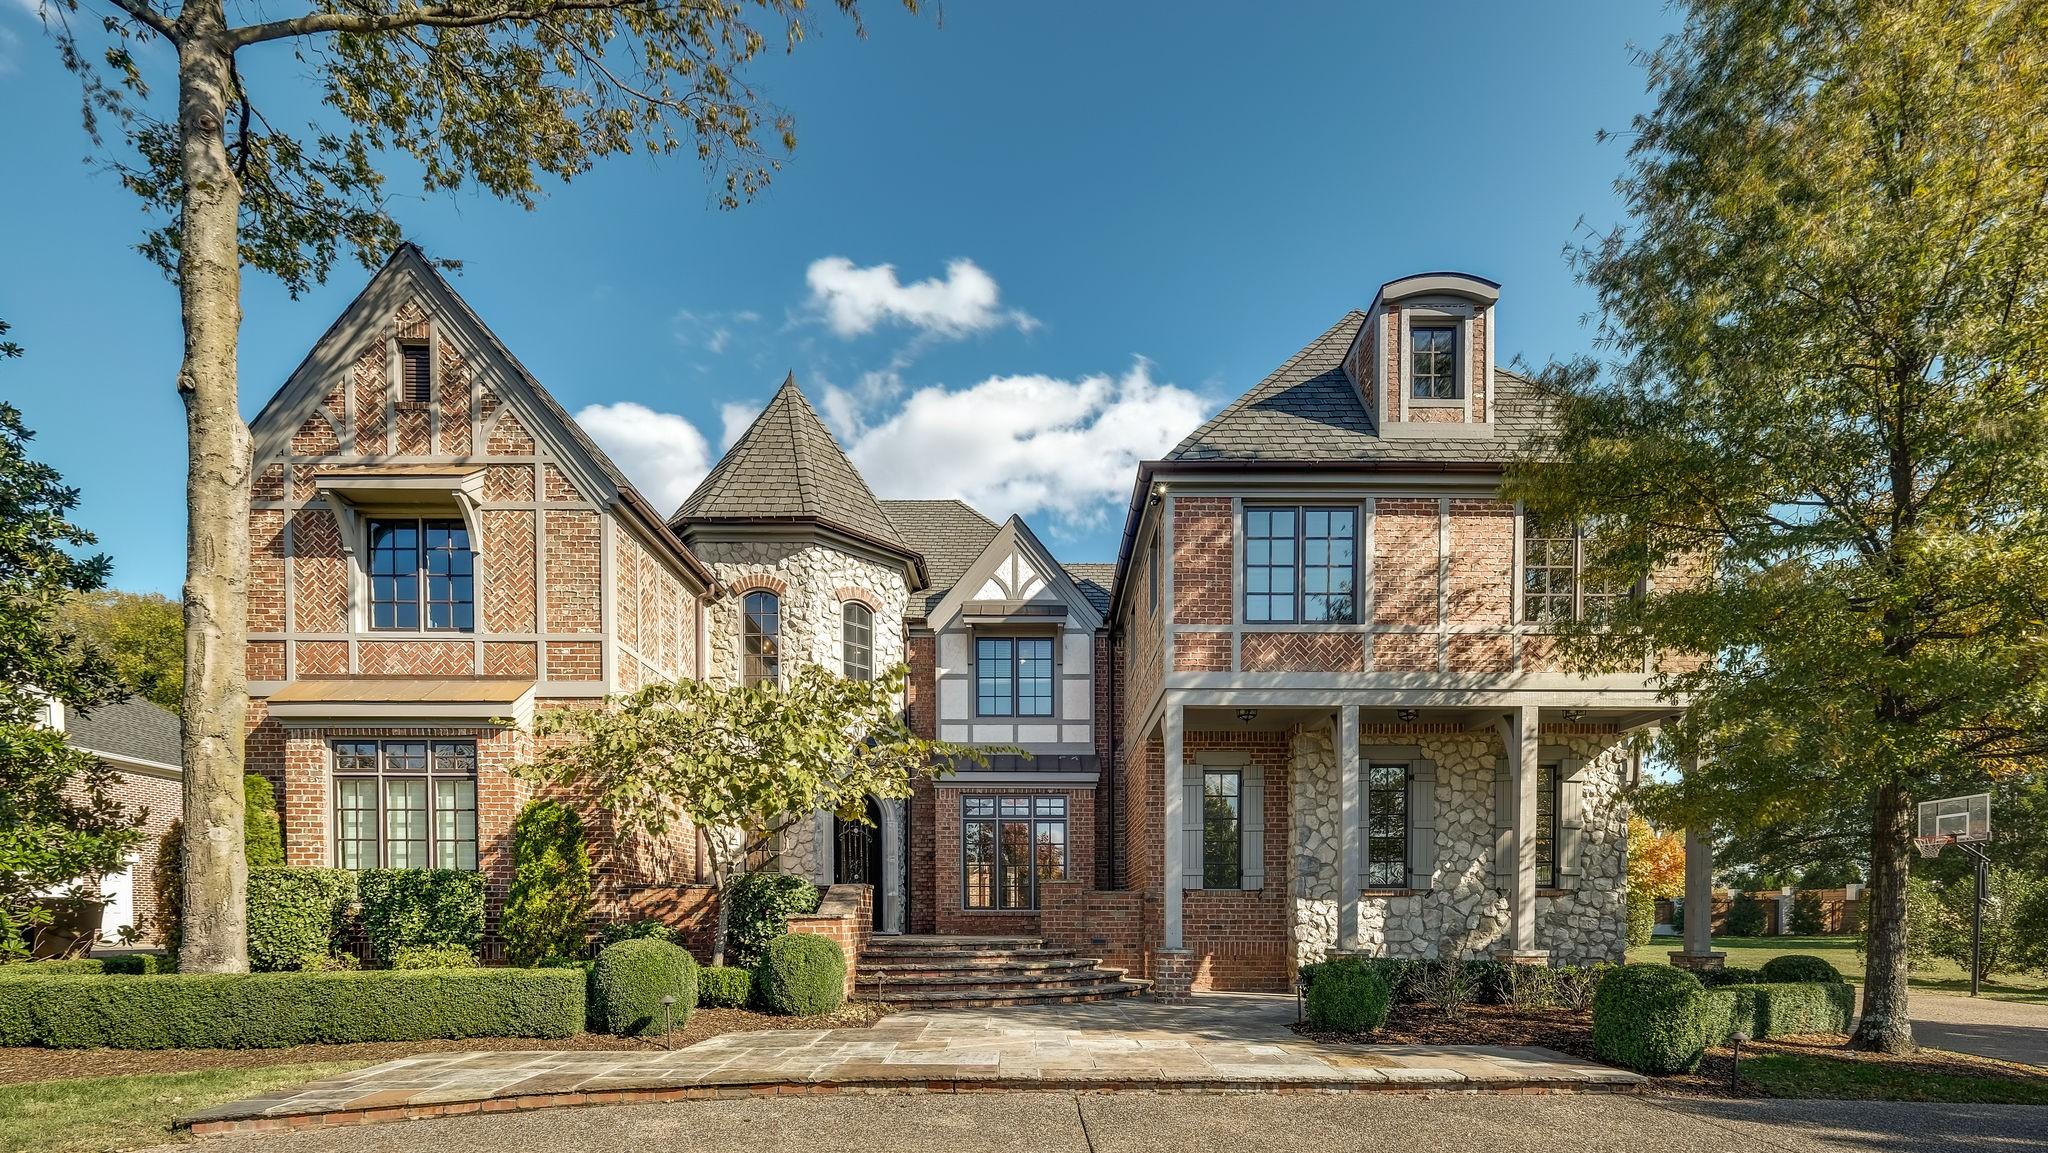 $2,550,000 - 5Br/9Ba -  for Sale in Noel Watkins Grove, Nashville